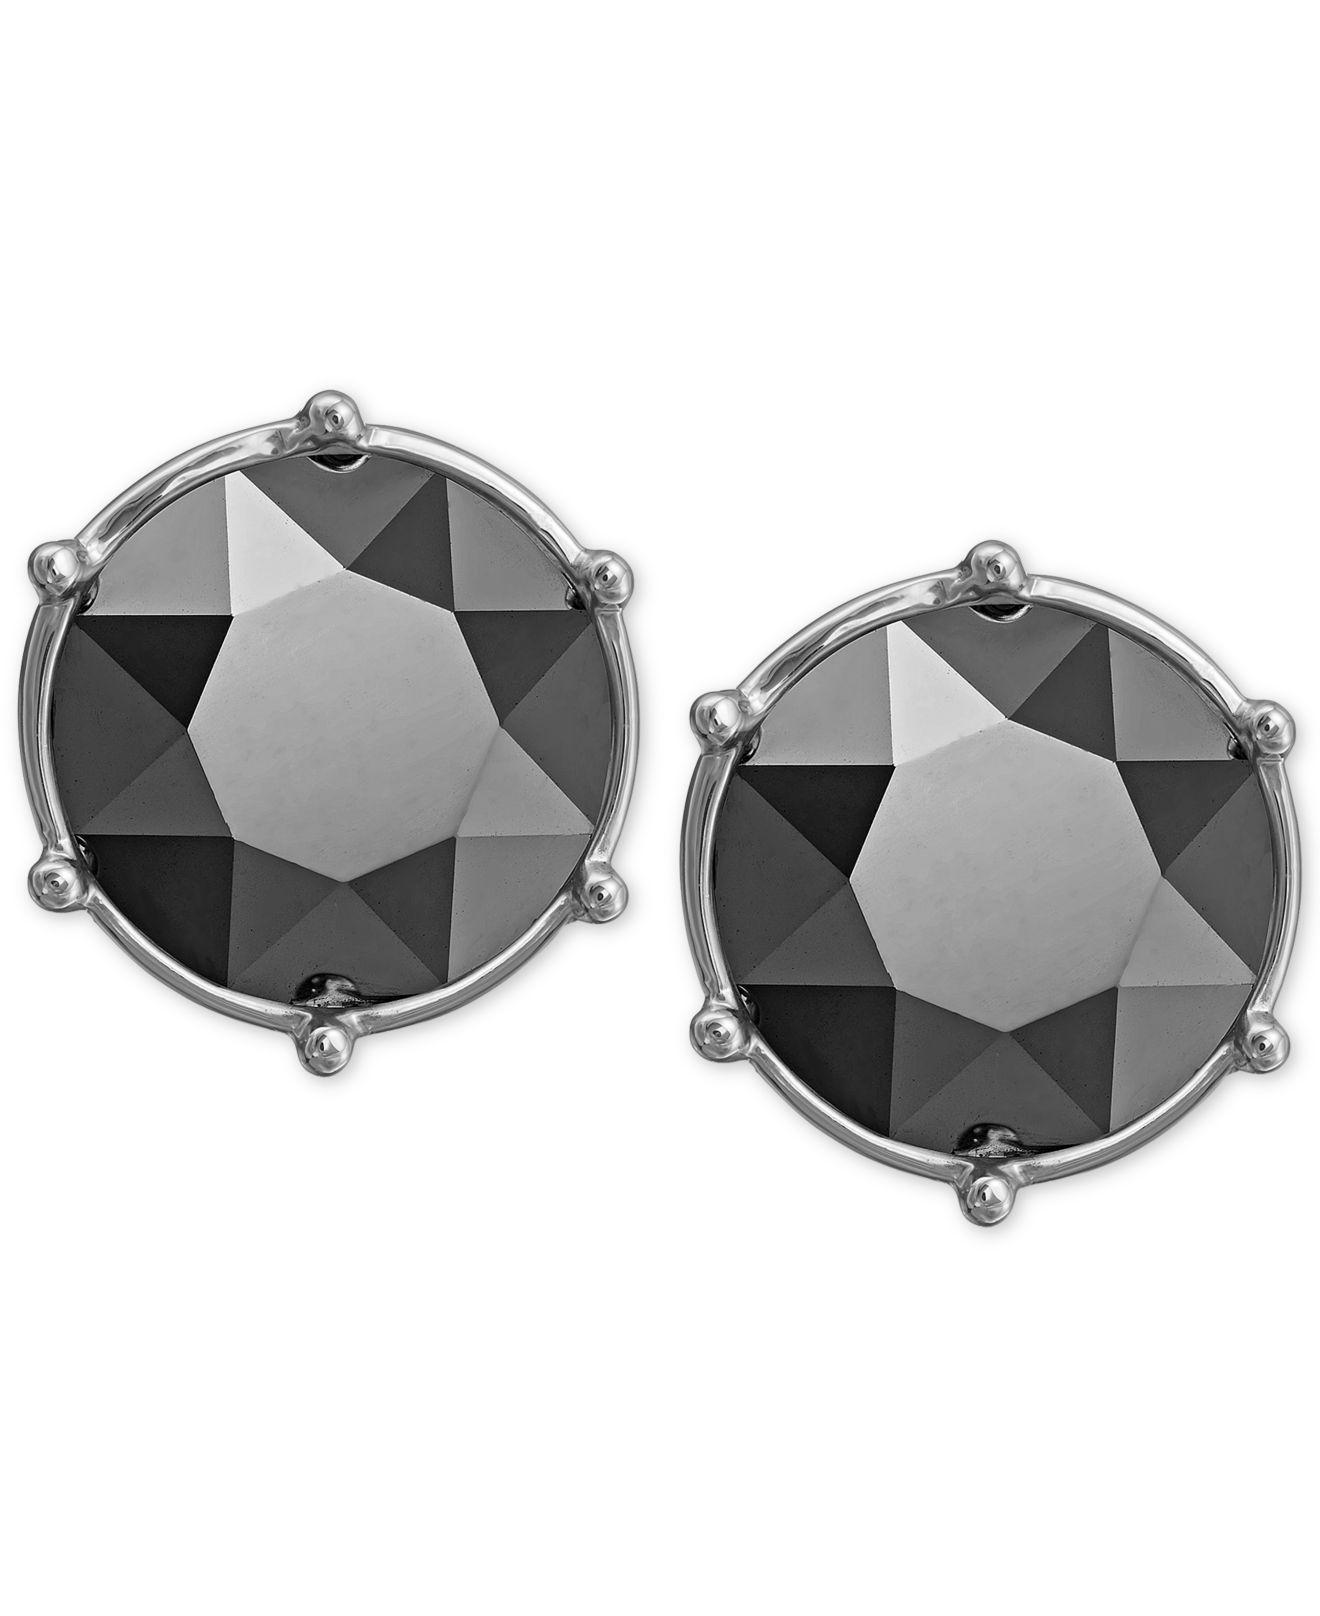 32623581d Swarovski Rhodium-plated Jet Hematite Crystal Stud Earrings in Black ...